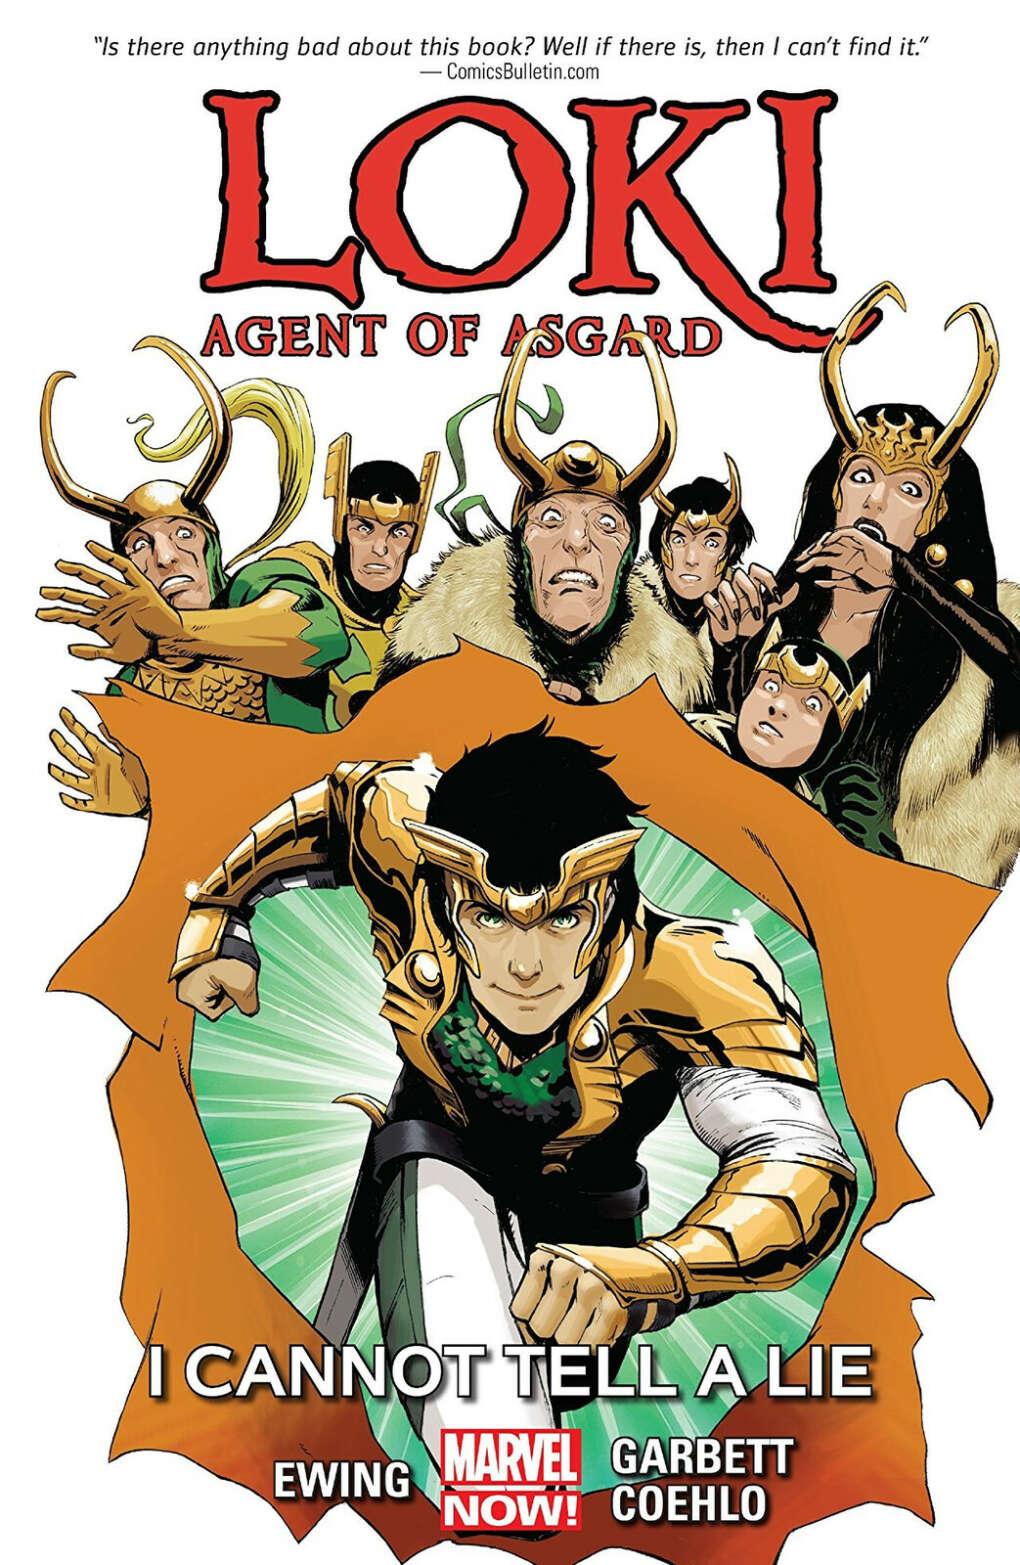 Loki: Agent of Asgard (том 2 и 3)